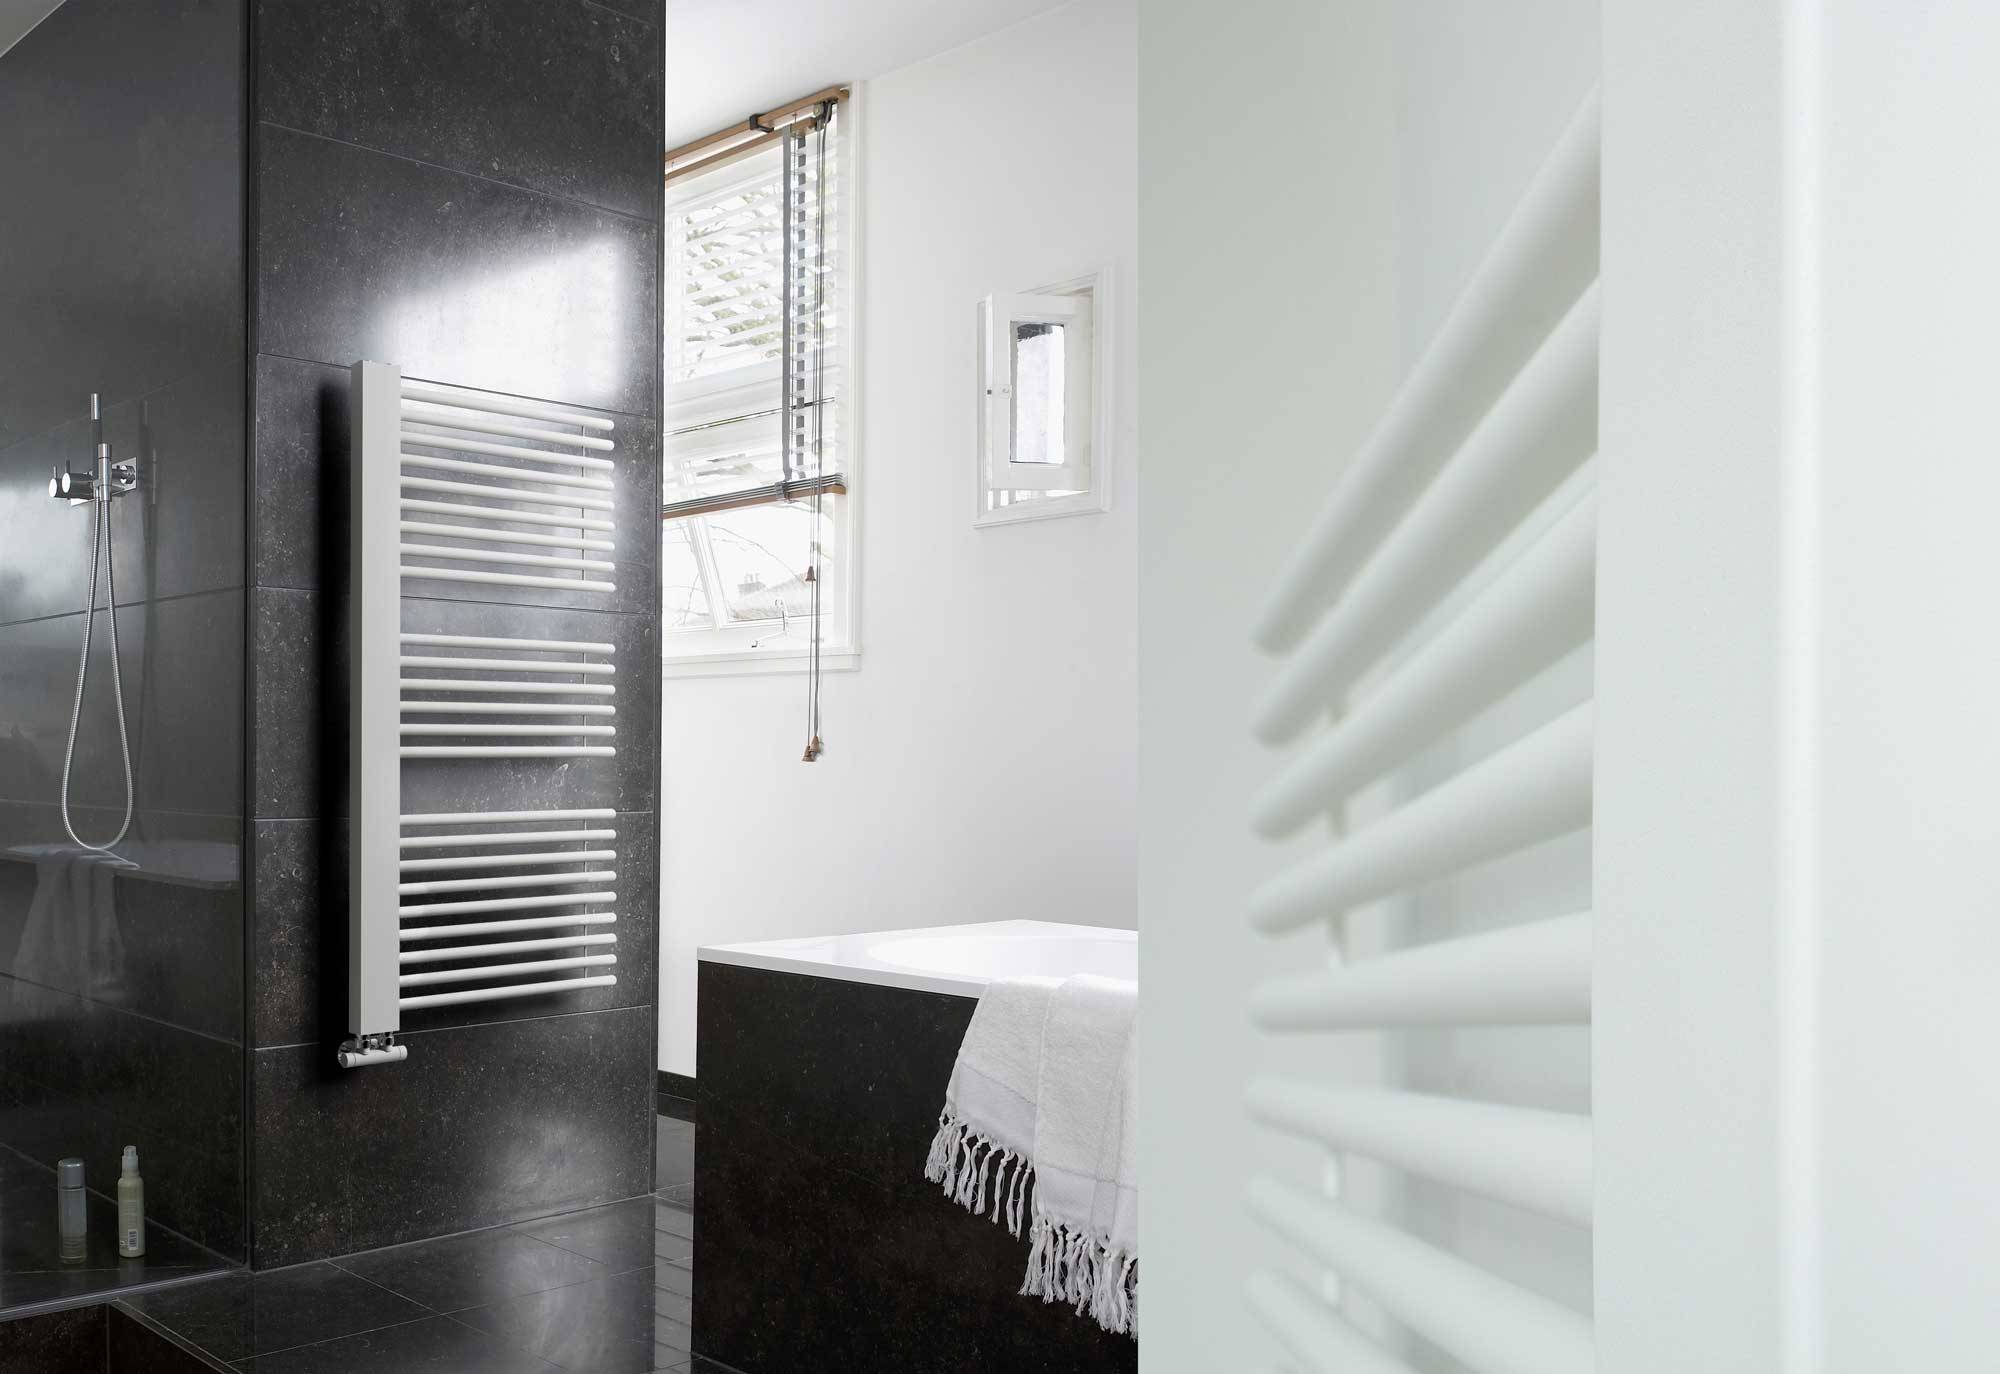 sèche-serviettes Grado lazzarini blanc particulier